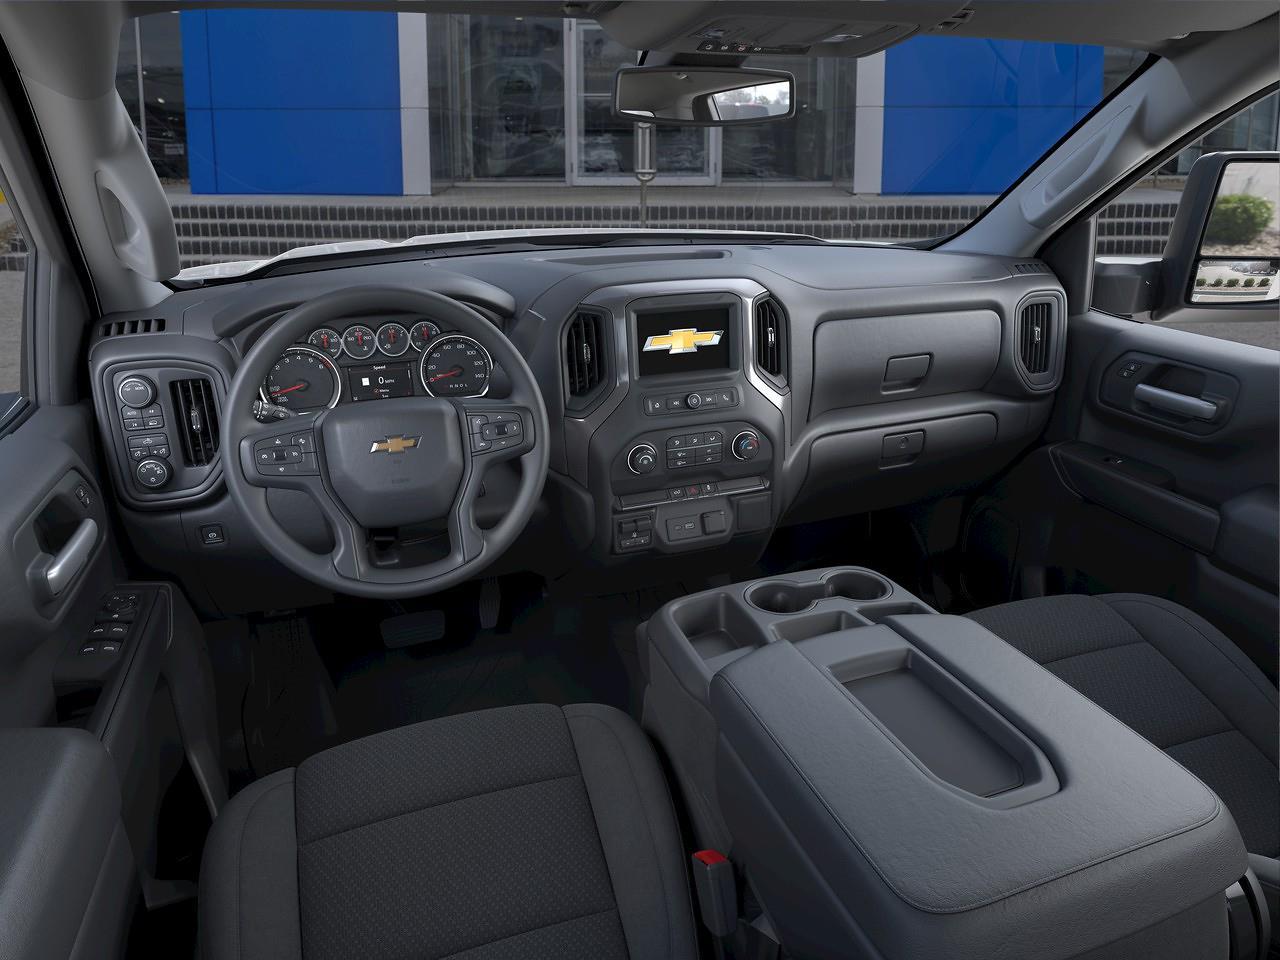 2021 Chevrolet Silverado 1500 Crew Cab 4x4, Pickup #M1314 - photo 12